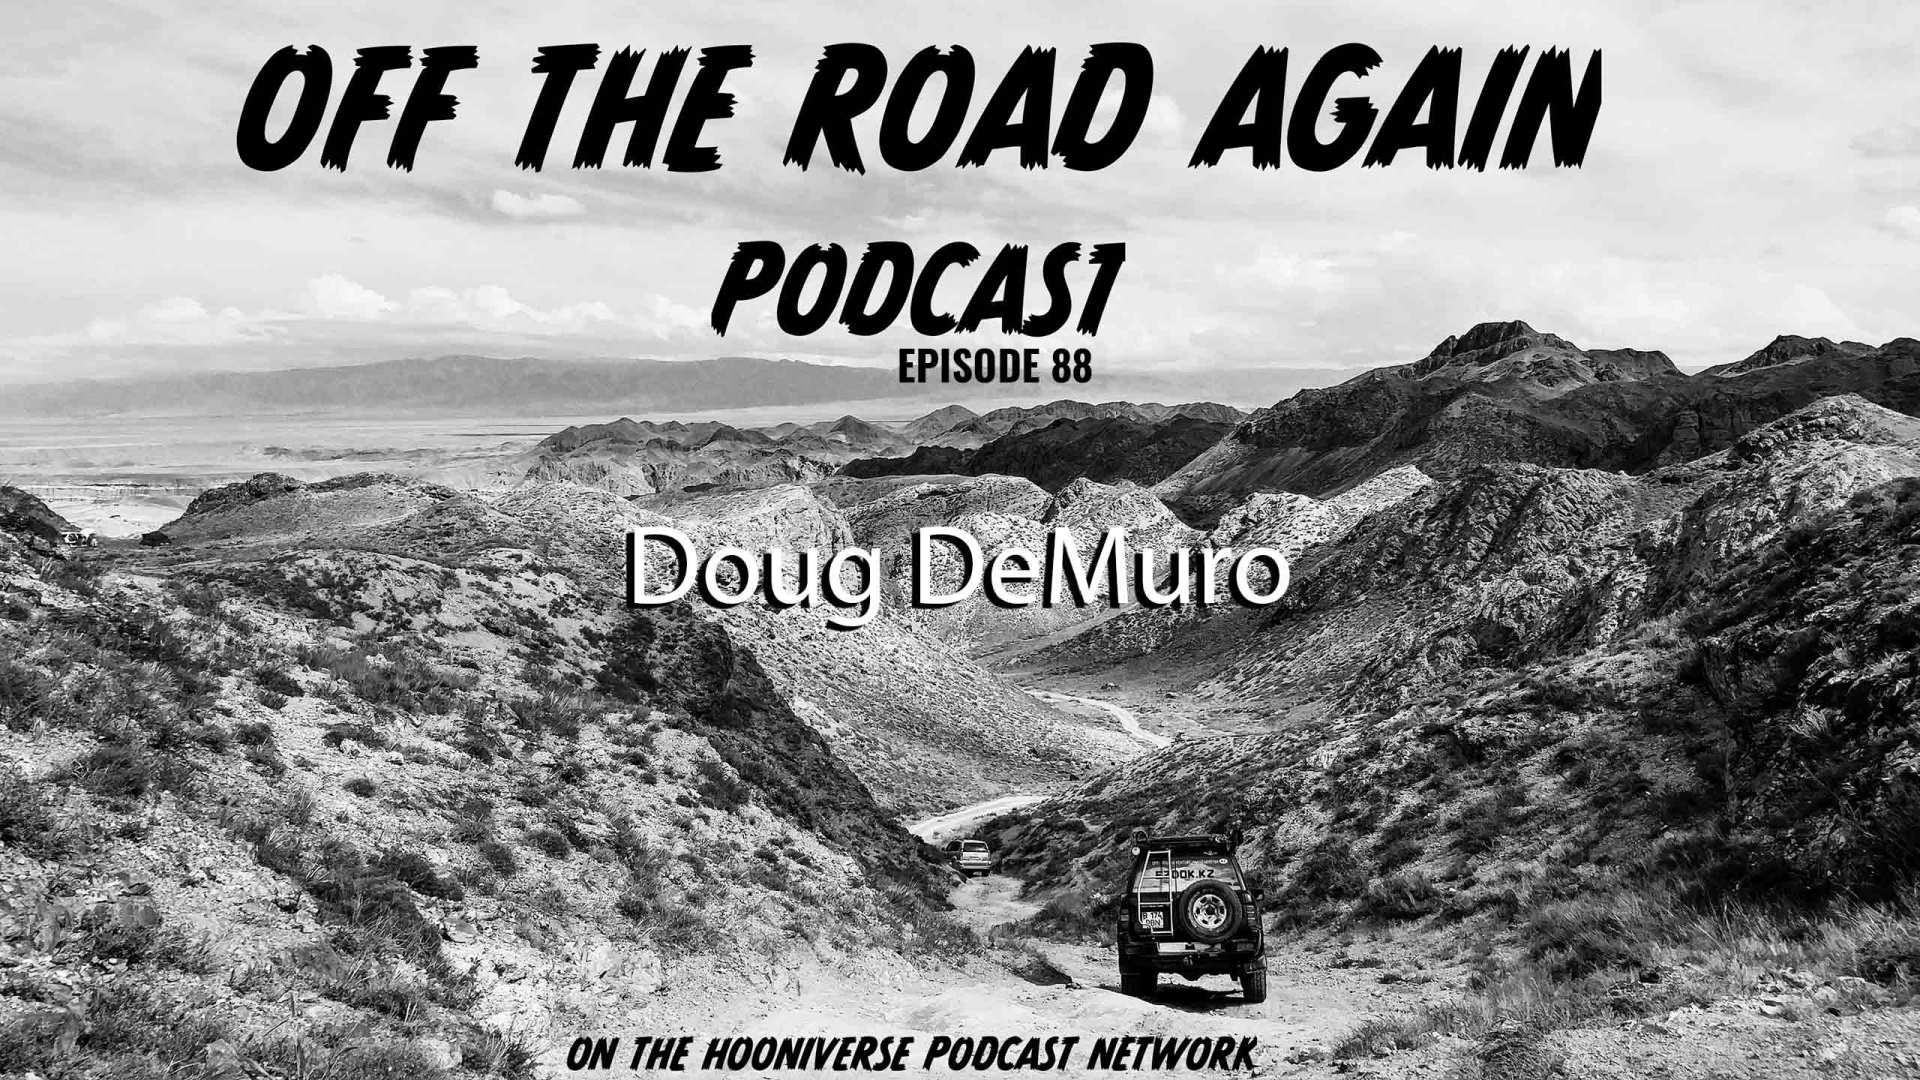 Doug-DeMuro-Off-The-Road-Again-Podcast-Episode-88